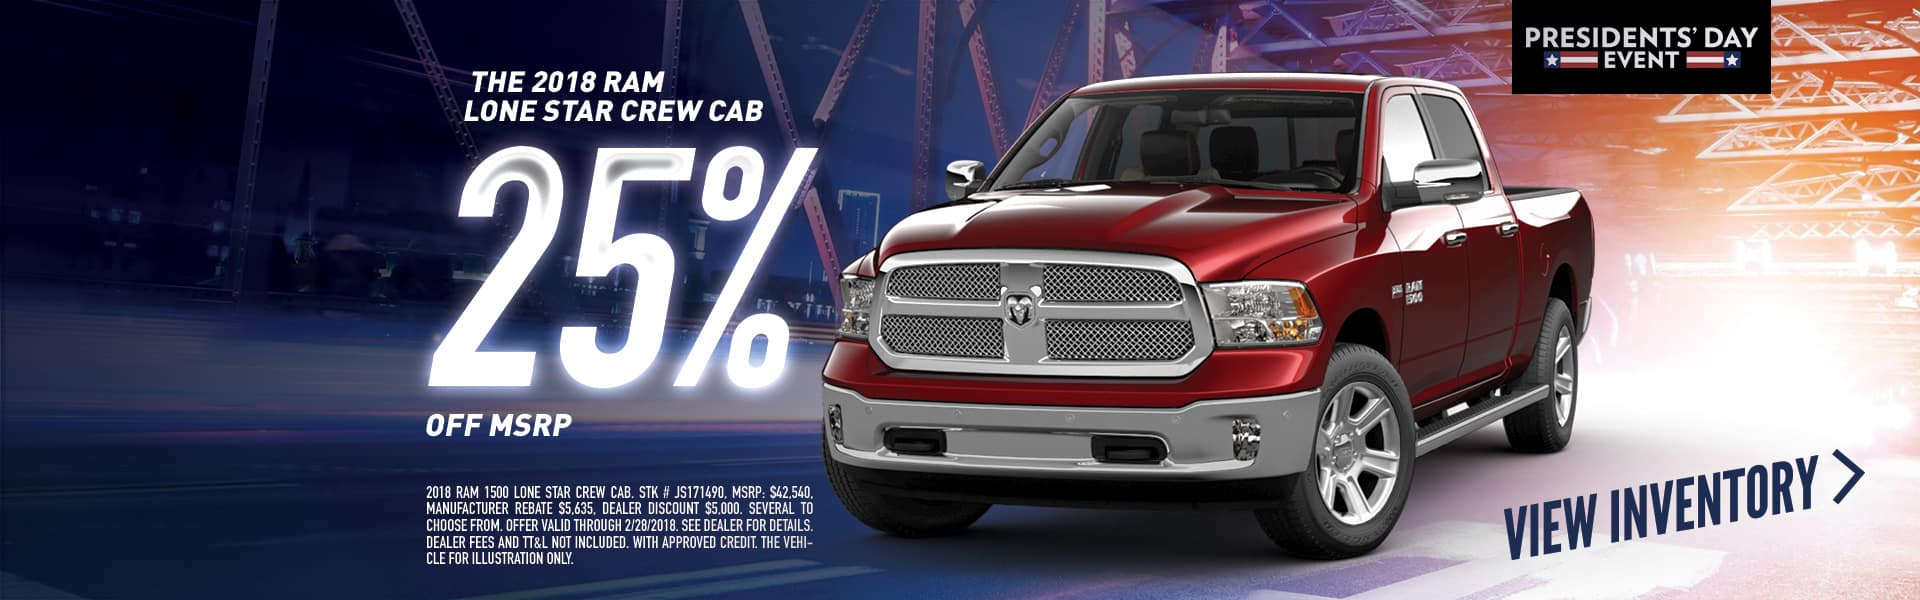 2018-ram-1500-lone-star-crew-cab-for-sale-dallas-tx